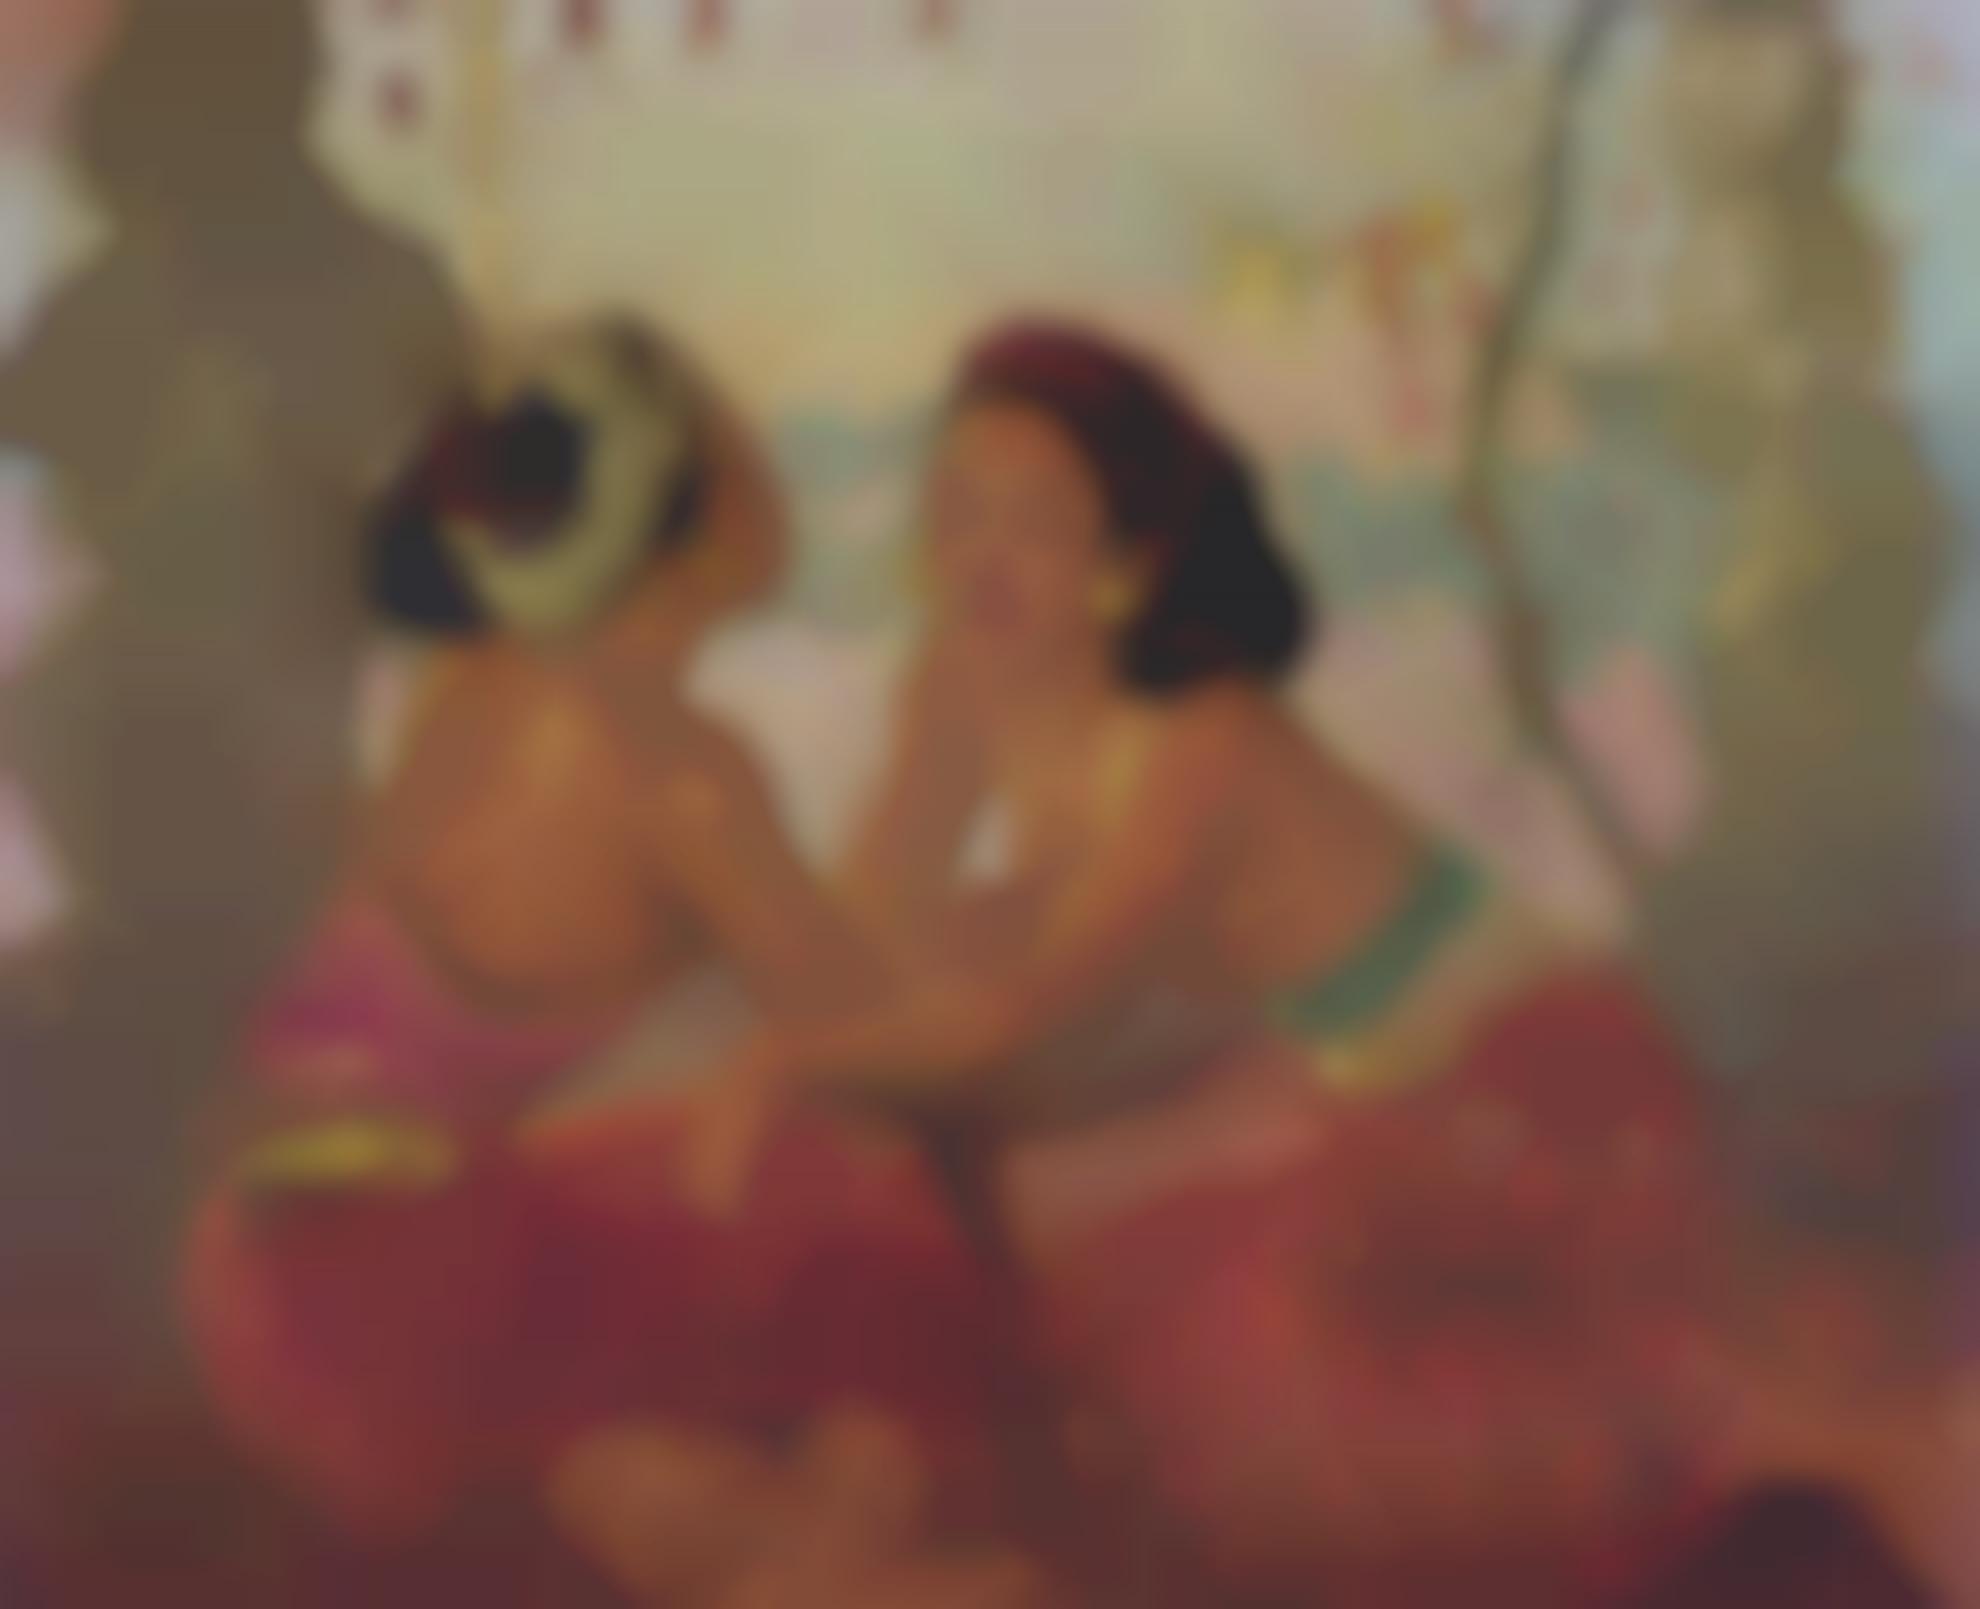 Adrien Jean Le Mayeur De Merpres-Renang And Ni Pollok-